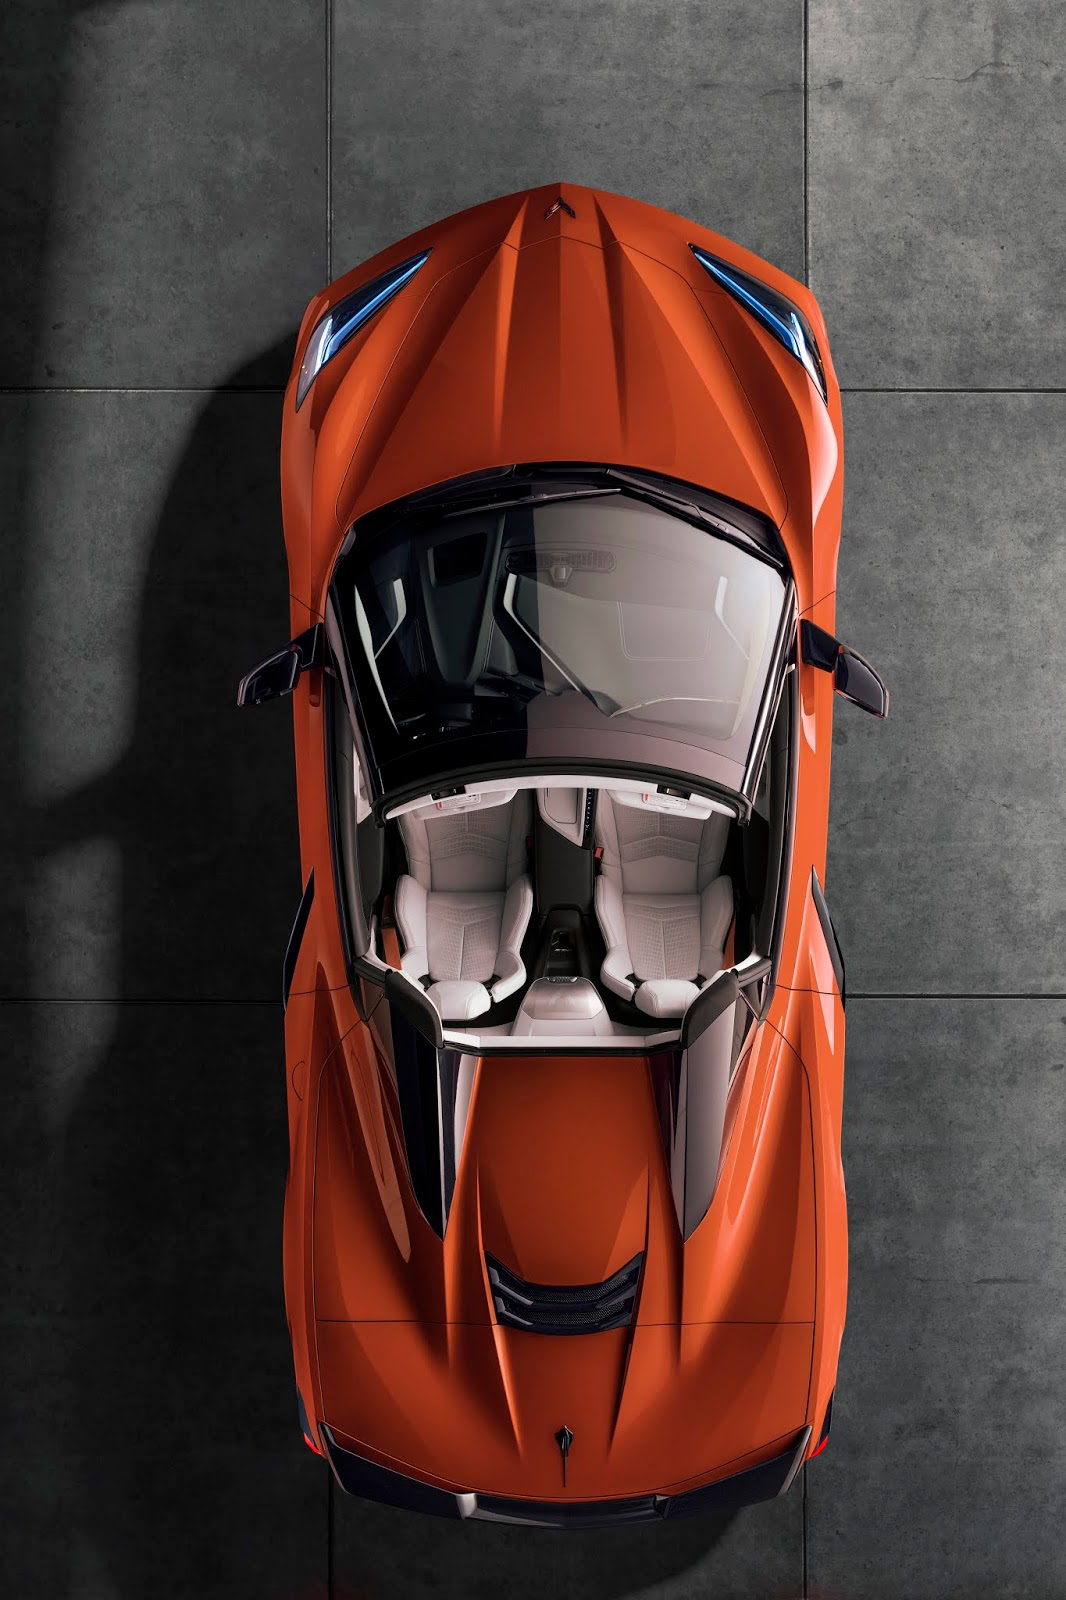 2020 Chevrolet Corvette Stingray Convertible 007 Γιατί η C8 Convertible είναι η καλύτερη Corvette ever C8, Chevrolet, Chevrolet Corvette, Corvette, zblog, ειδήσεις, καινούργιο, καινούρια, καινούριο